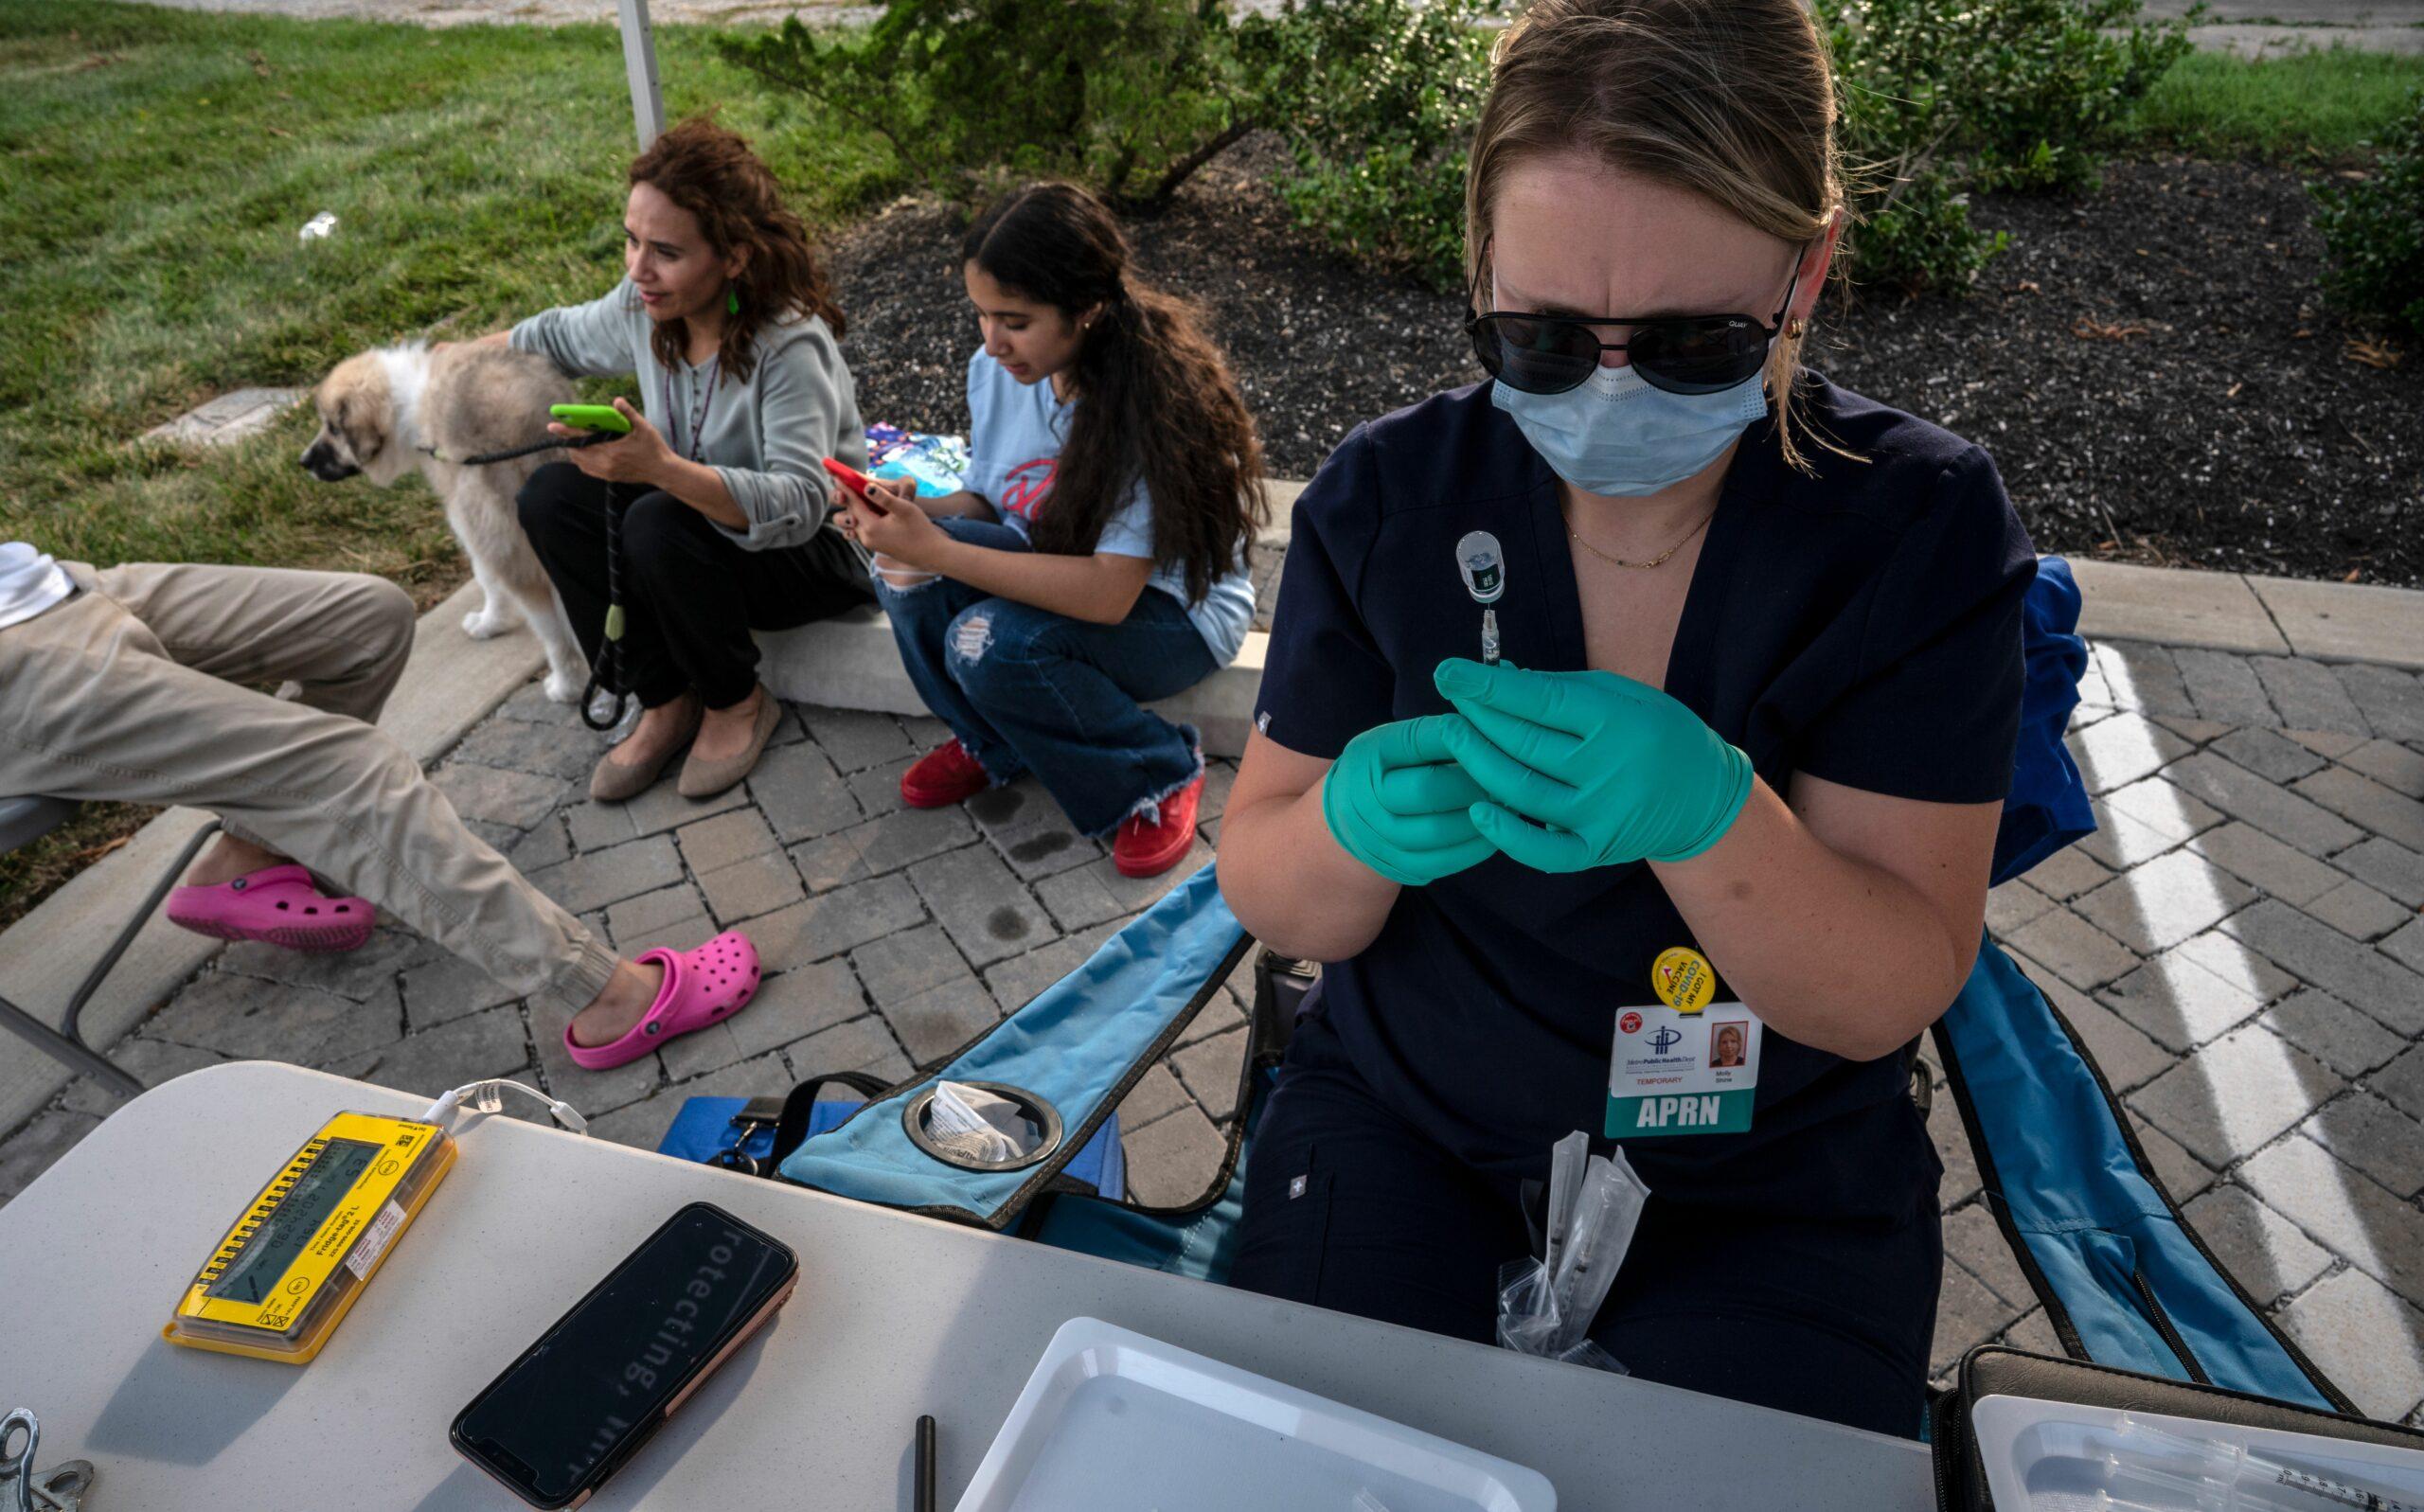 Metro Public Healthy Molly Shine preps a vaccine while sister Maya and Sara Gana wait at a recent Nashville mobile vaccine clinic. (Photo: John Partipilo)